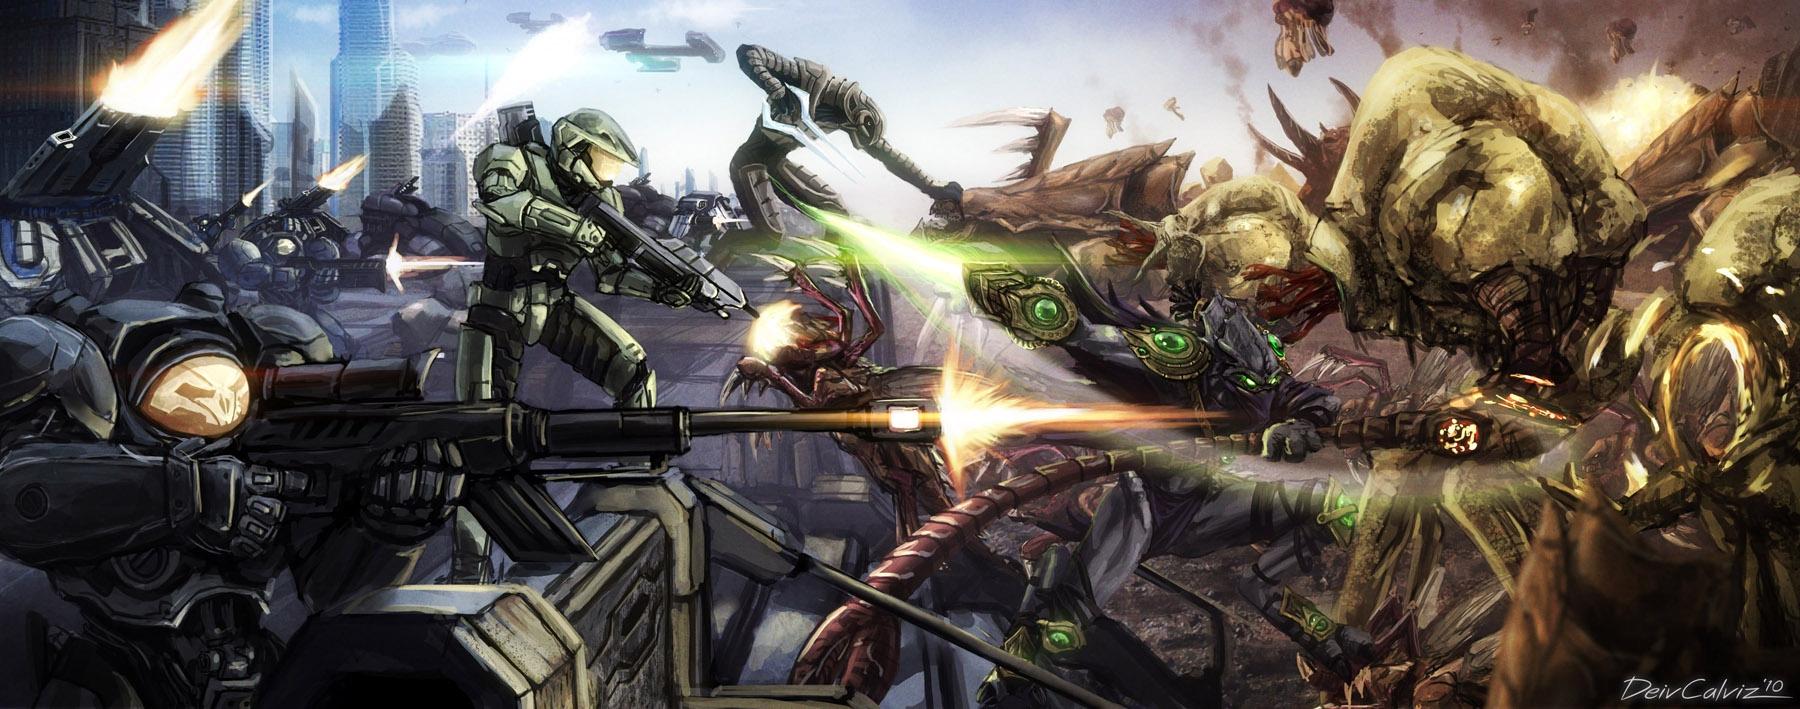 Starcraft x Halo